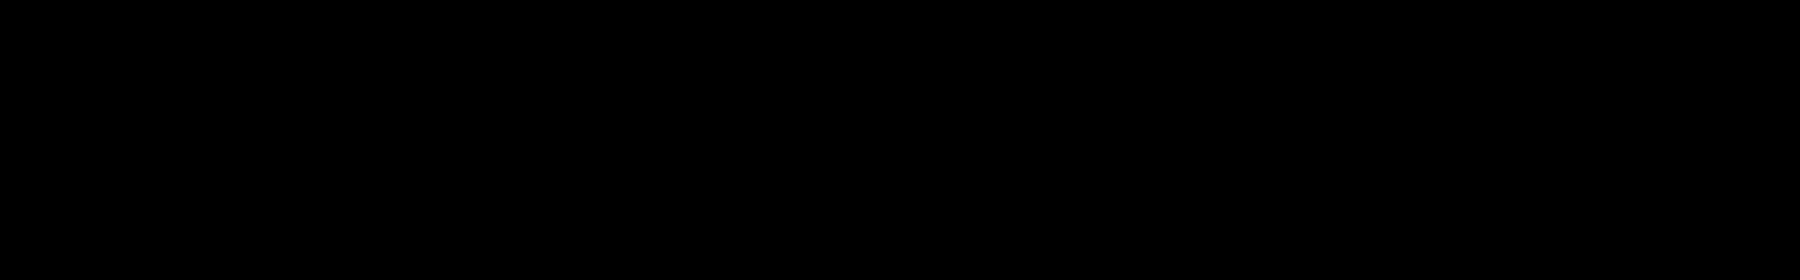 Killa Trap audio waveform